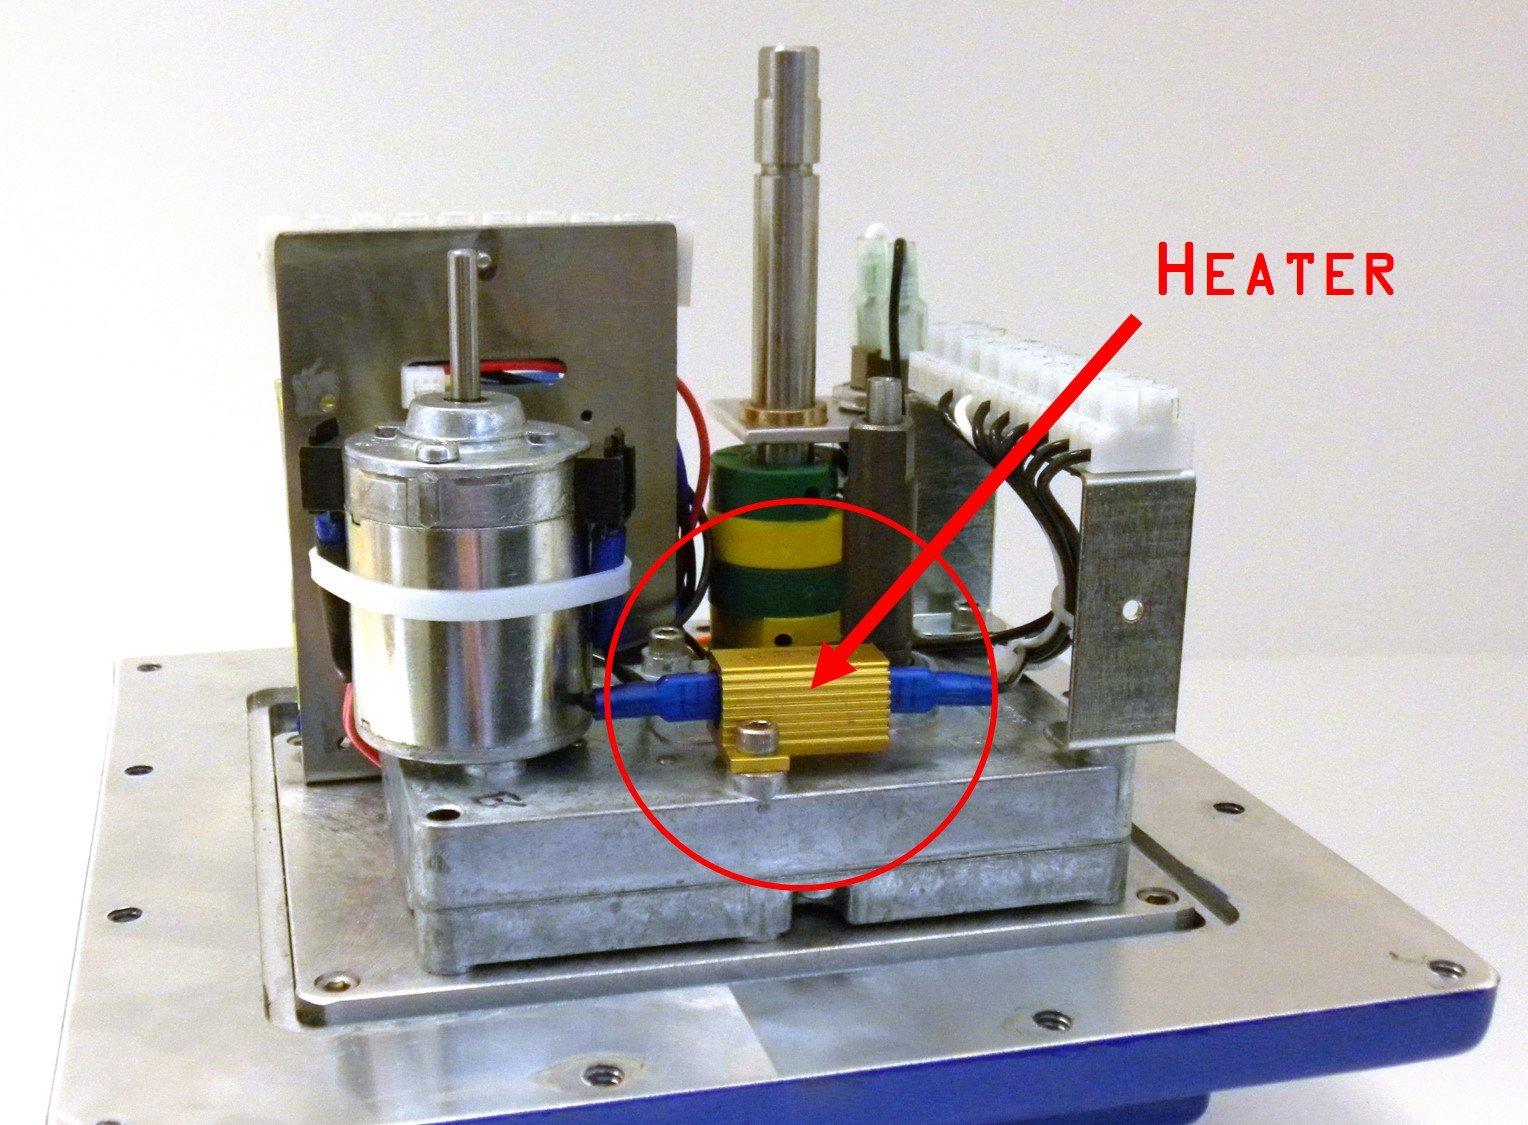 Heater to Prevent Condensation